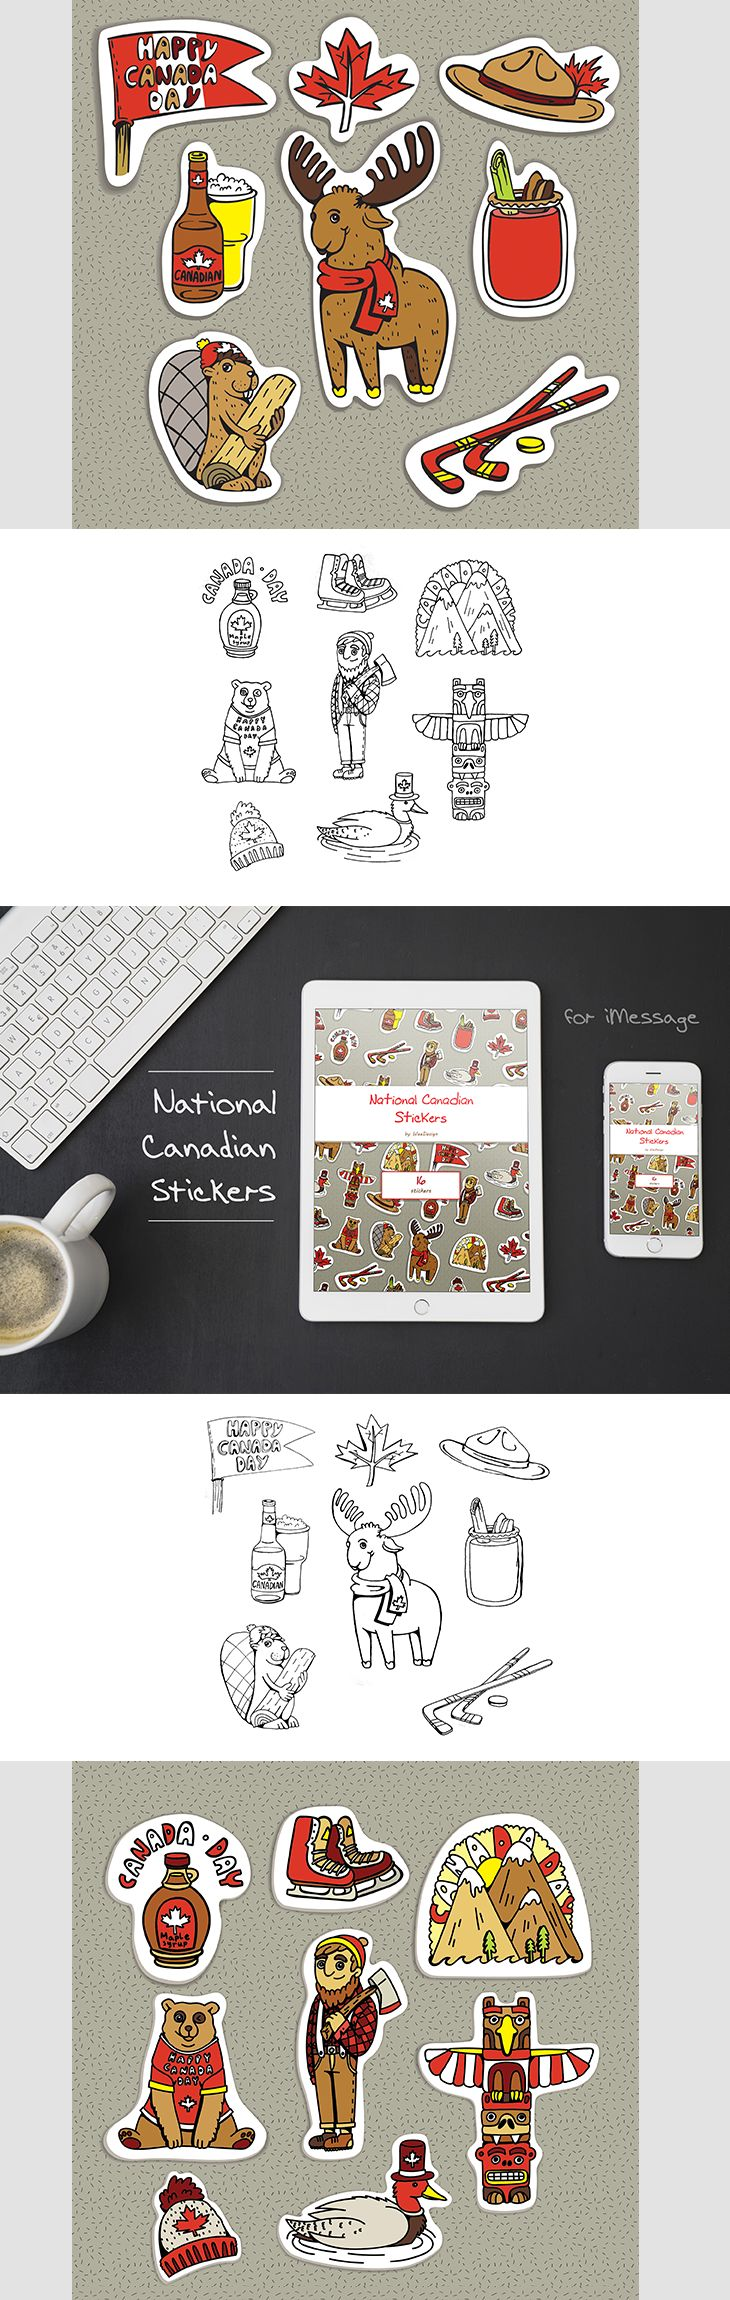 Stickers Nationaux Canadien